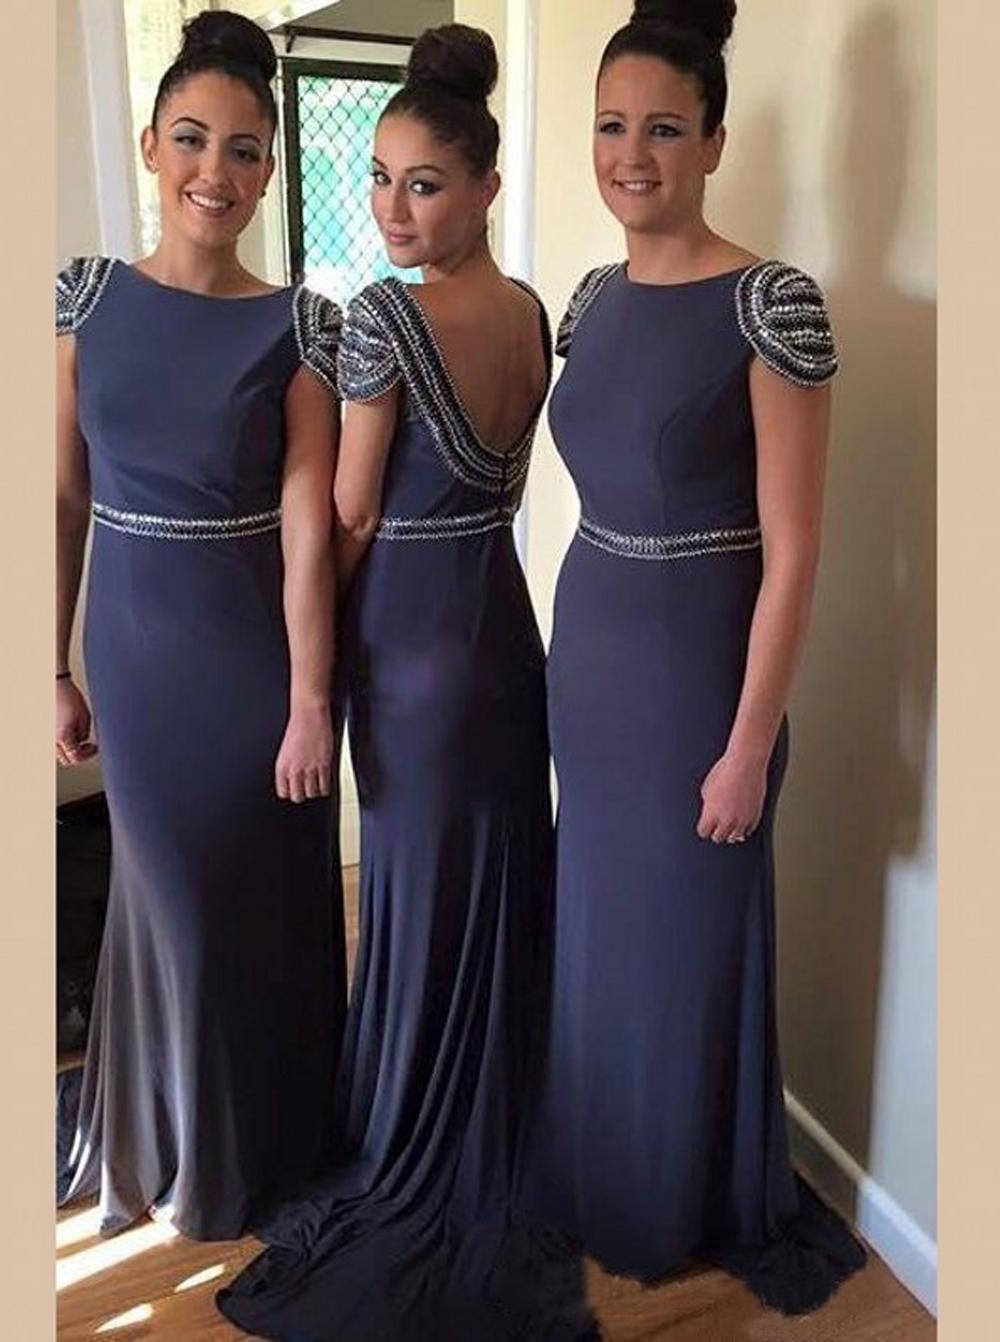 Awesome Sheath Bateau Open Back Court Train Bridesmaid Dress with Pearls фото